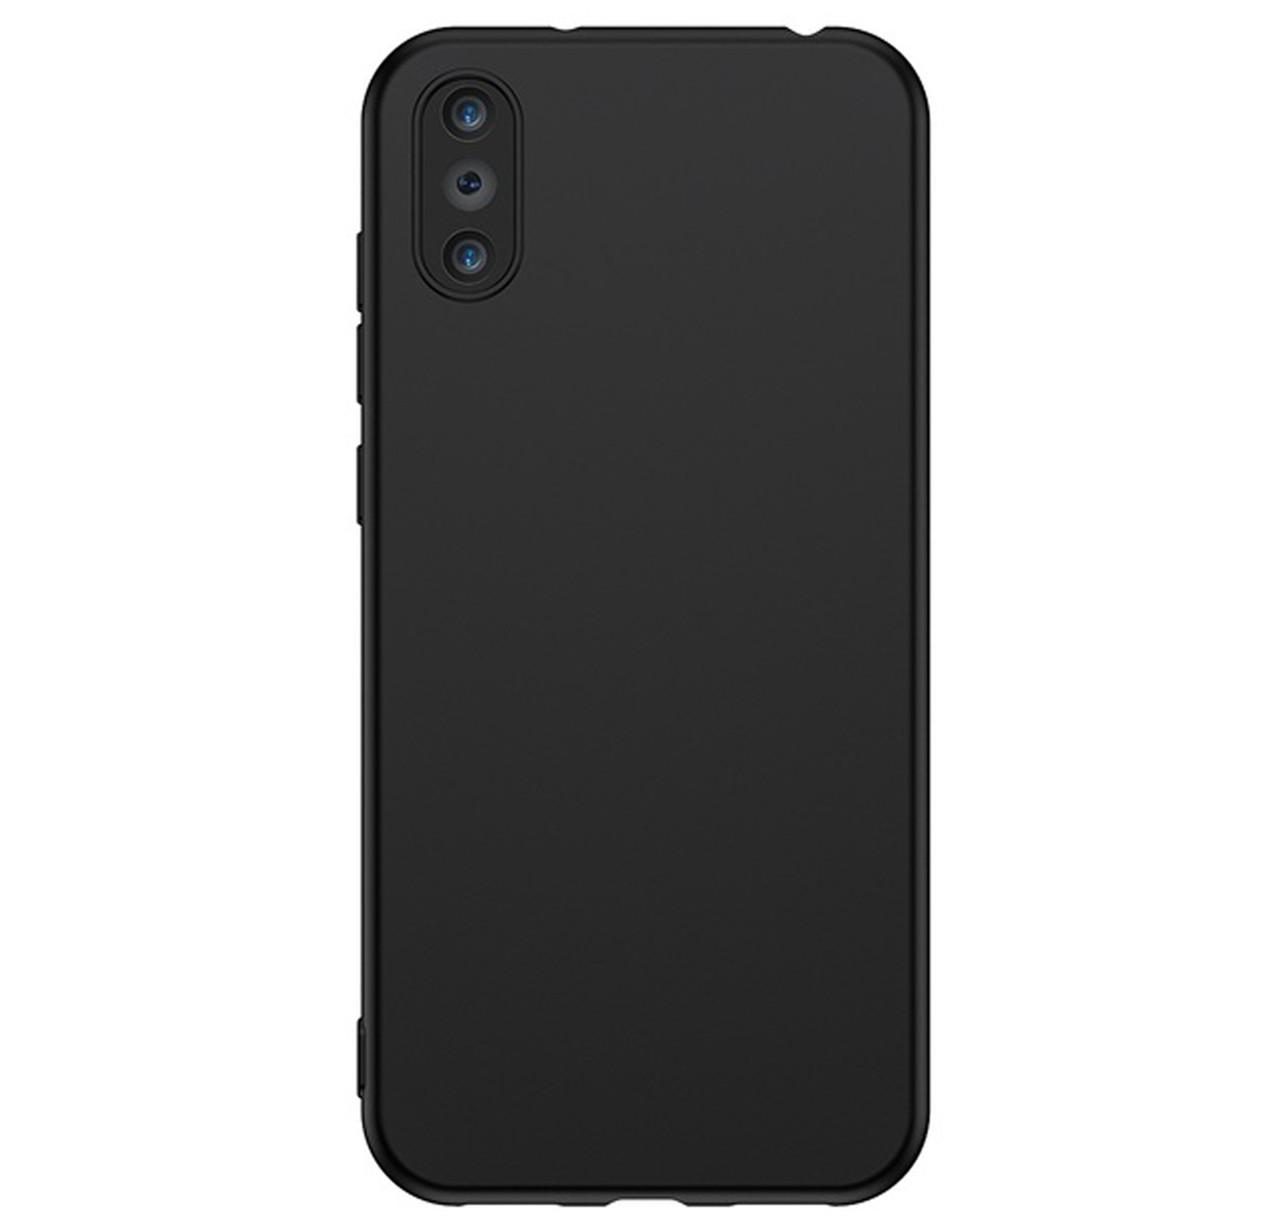 Чехол-накладка TPU T-PHOX Shiny для Huawei Y6 (2019) / Y6 Prime (2019) / Honor 8A